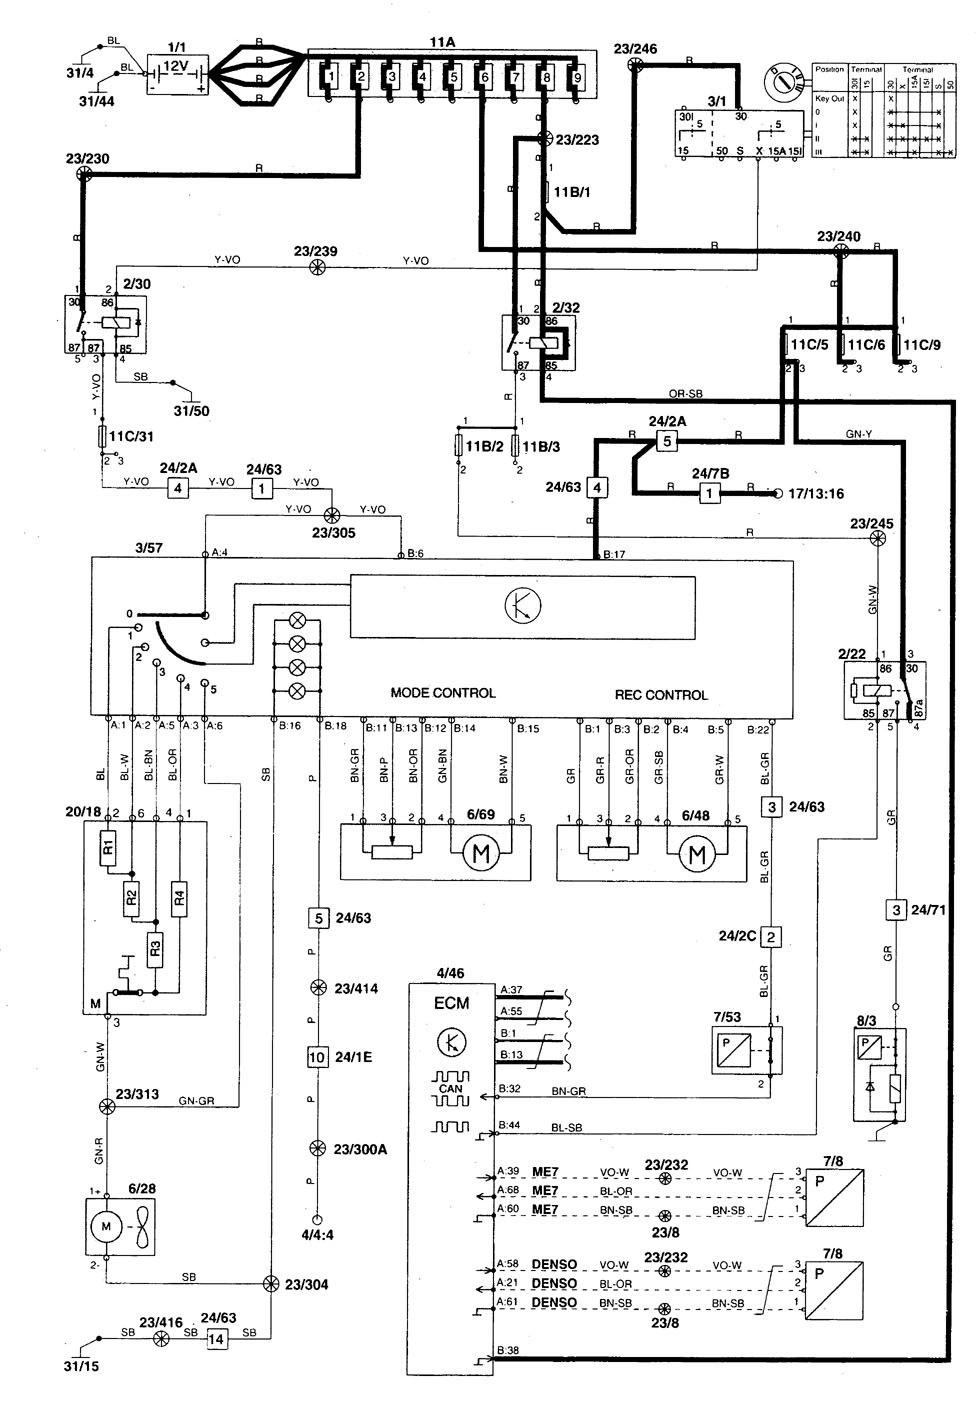 Volvo S70 (1998 - 2000) - wiring diagrams - HVAC controls -  Carknowledge.info | Volvo S70 Wiring Diagram |  | Carknowledge.info